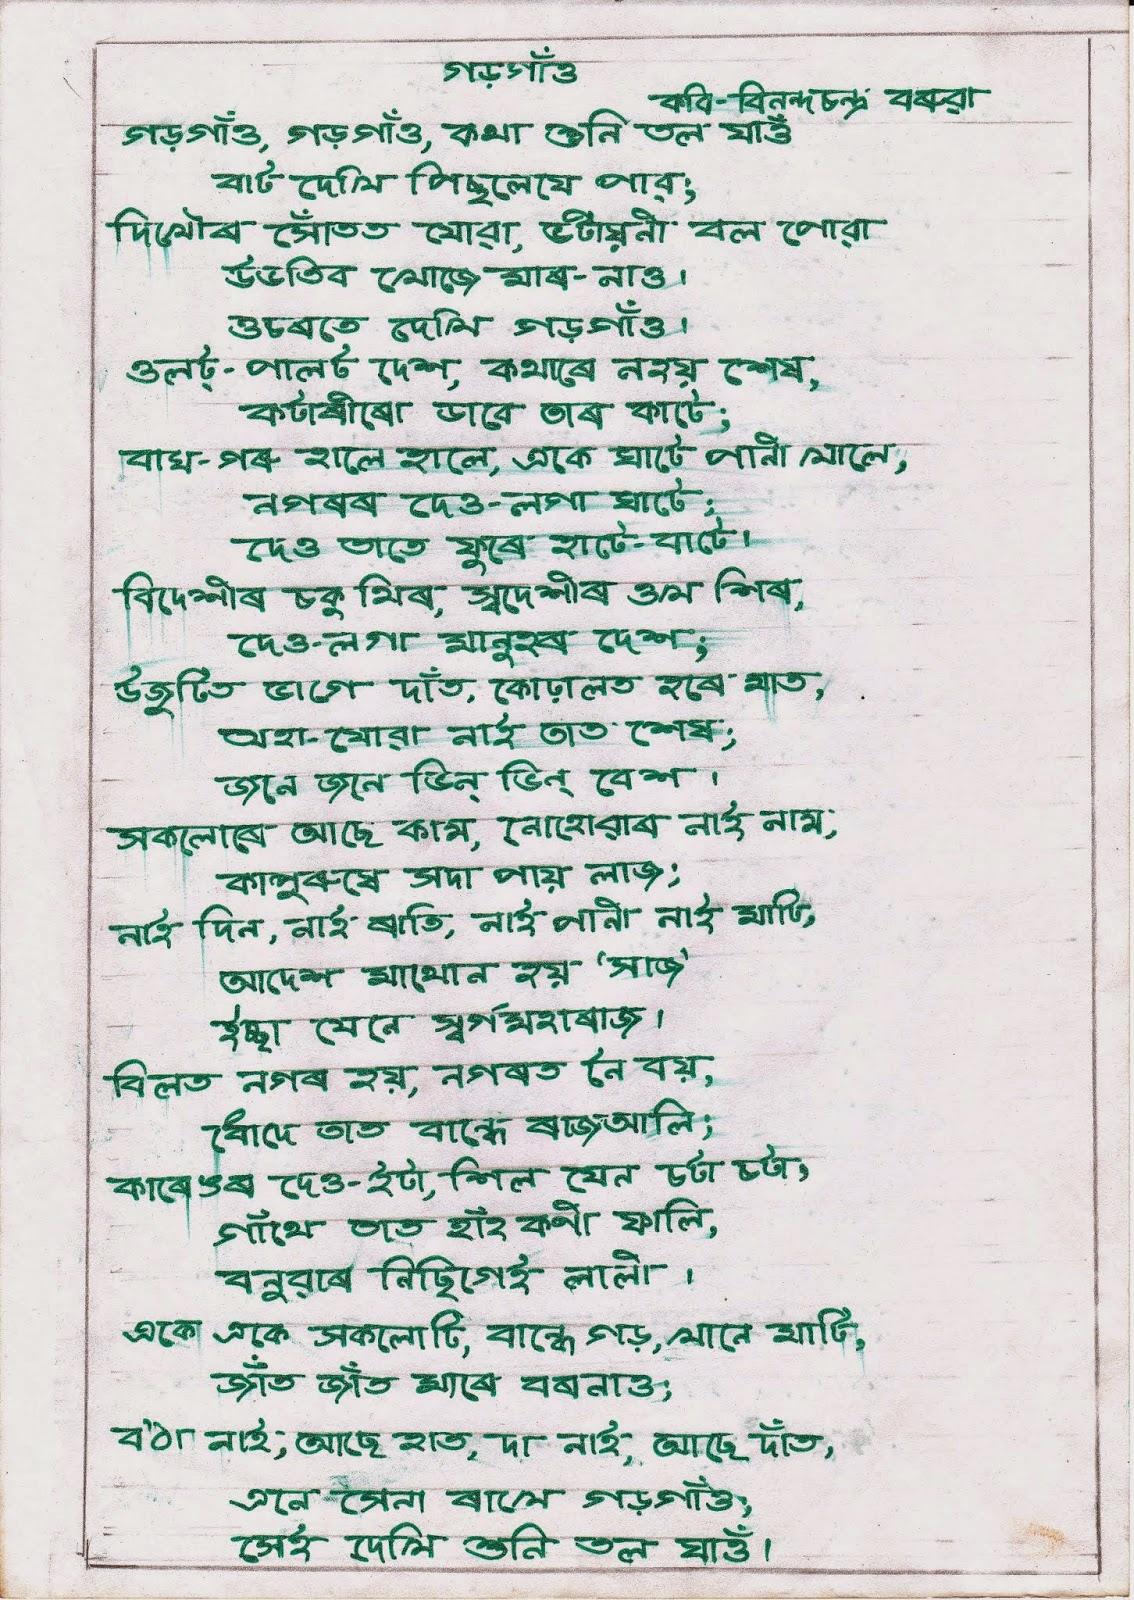 swadesh prem Swadesh prem essay in gujarati language long words for essay quotes dissertation writing experts essay on gandhi jayanti in malayalam today i had to write an essay.